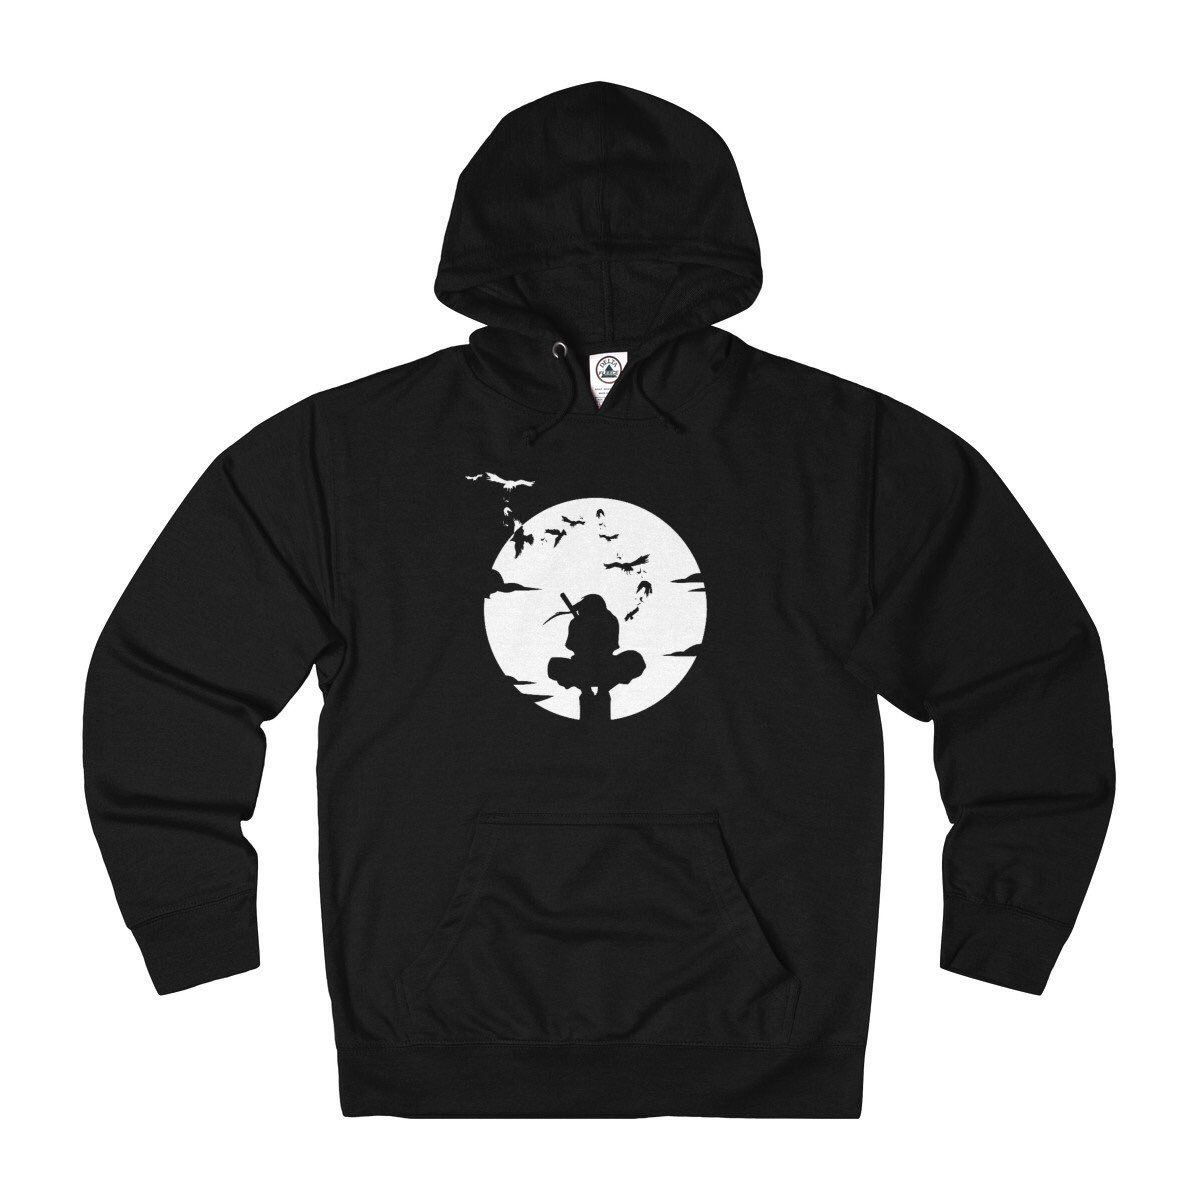 Itachi hoodie (8 colors) Link: etsy.com/listing/636053…